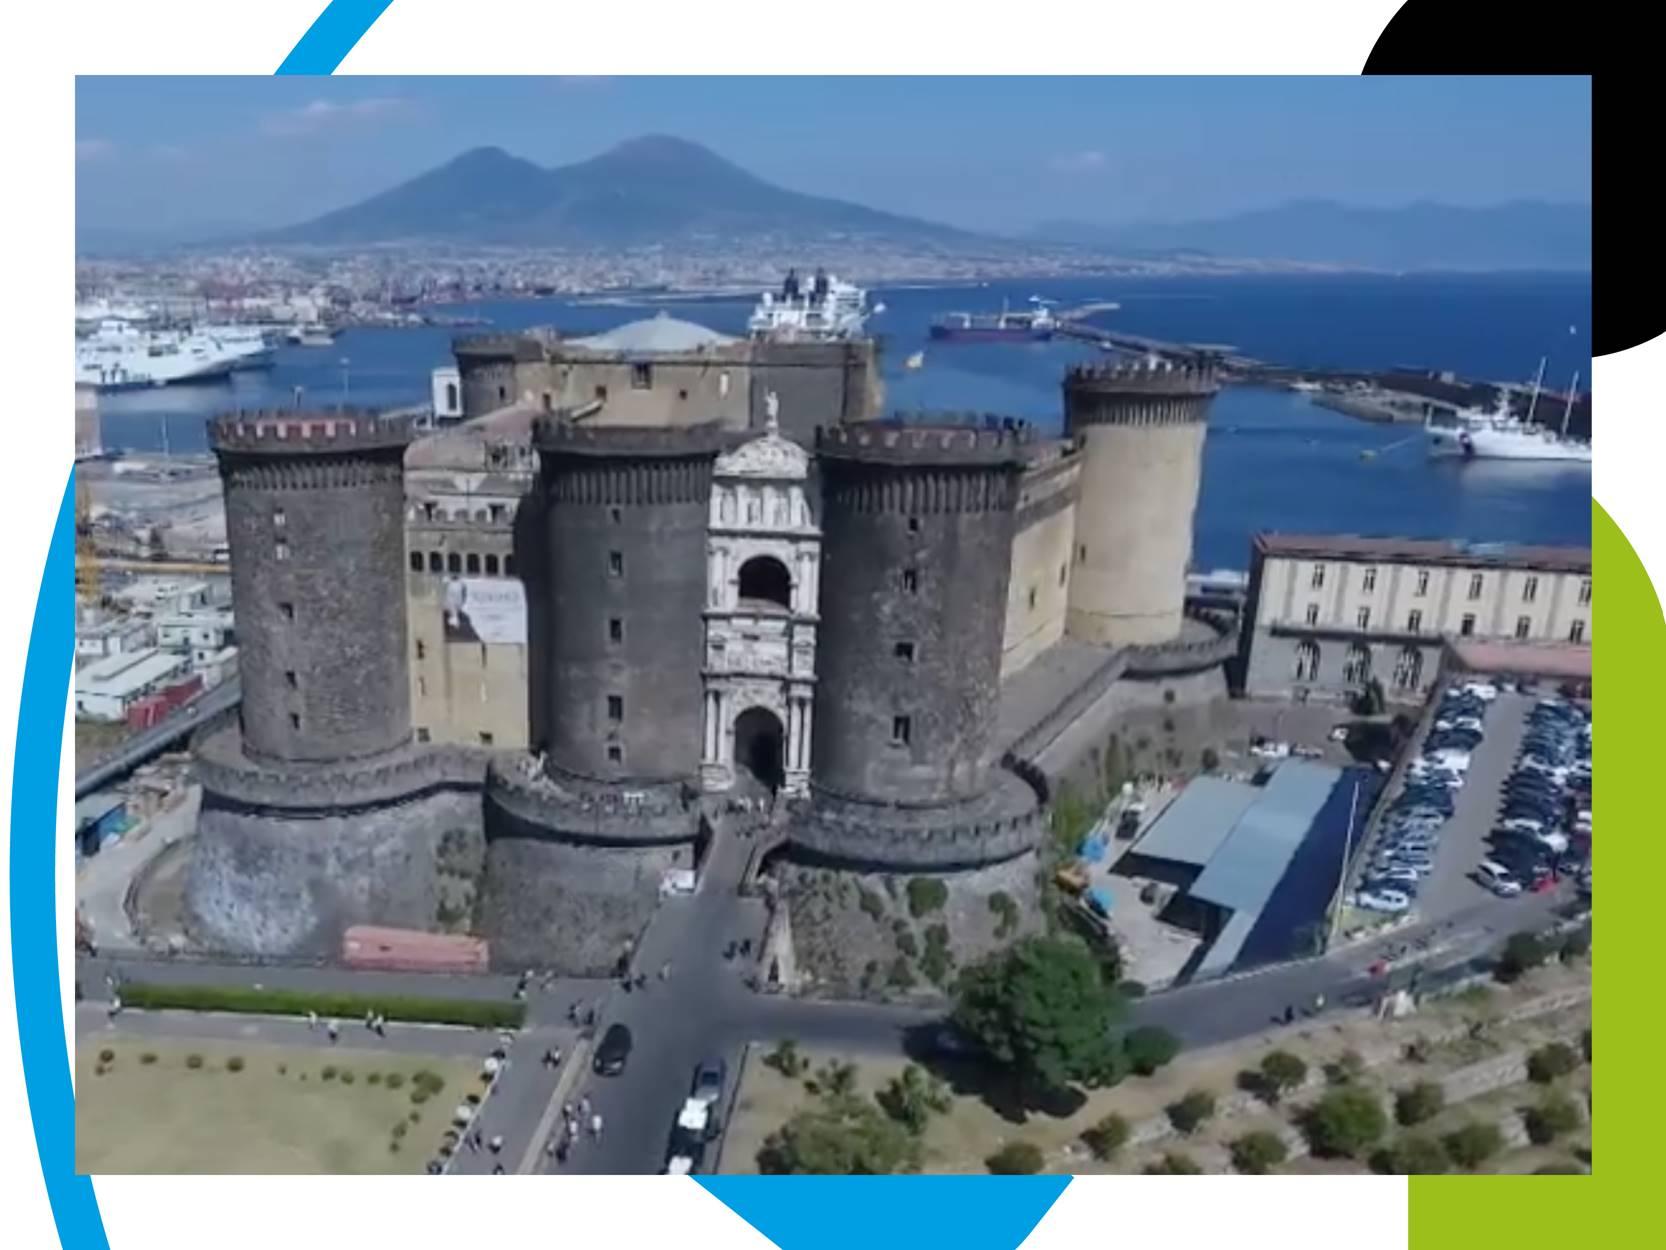 box-blog-napoli-sotto-sopra-pompei-san-gregorio4.jpg